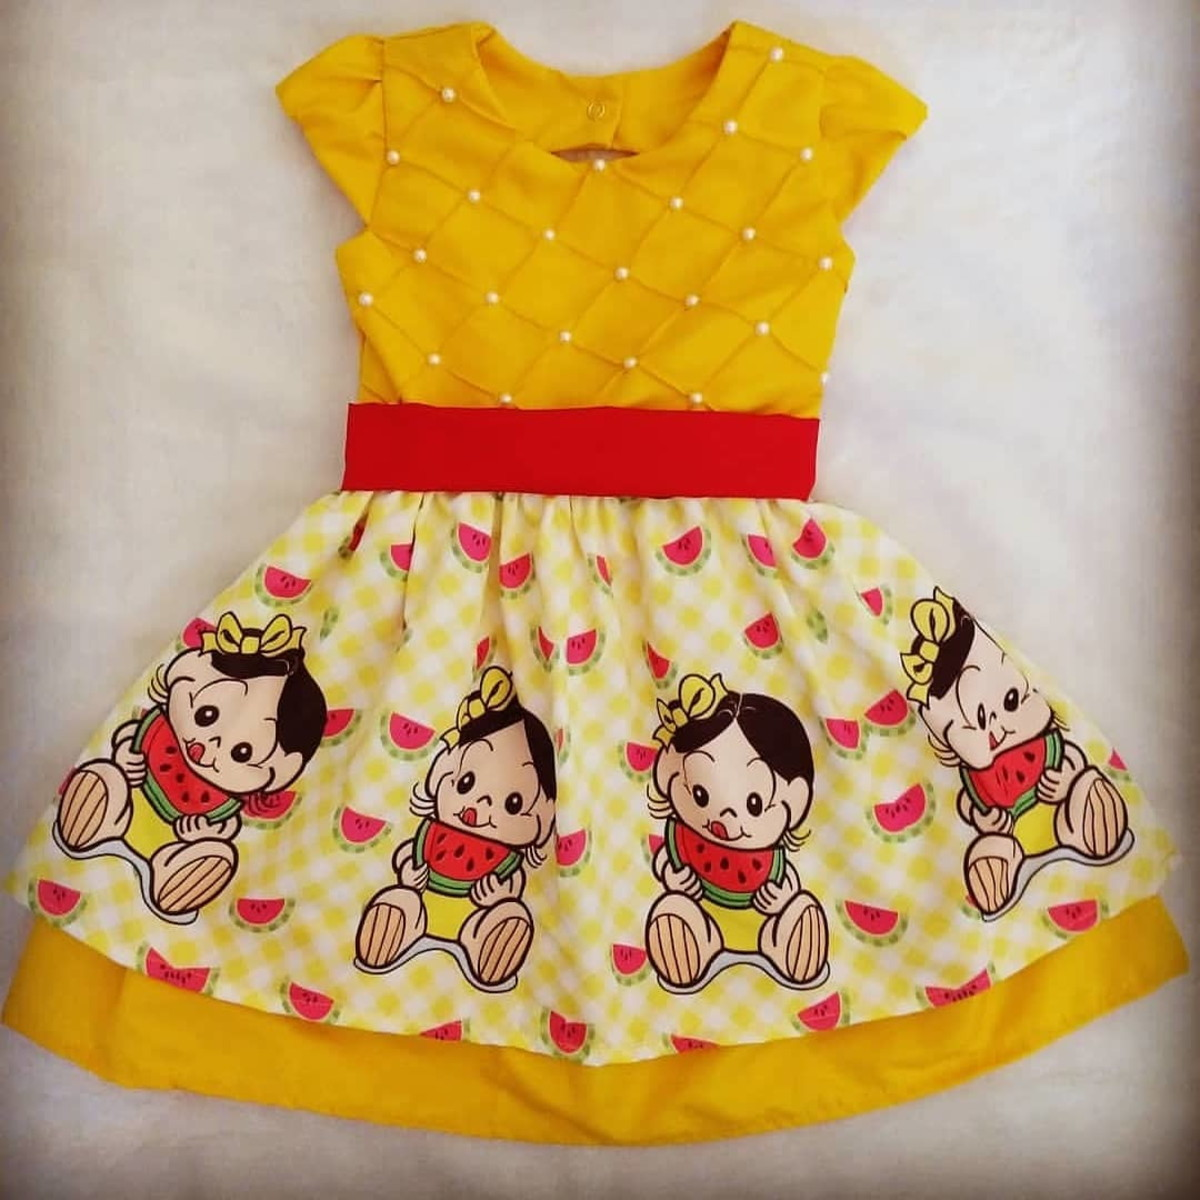 b7f0e2bc00 Vestido Luxo Magali Baby - 1 Ano no Elo7